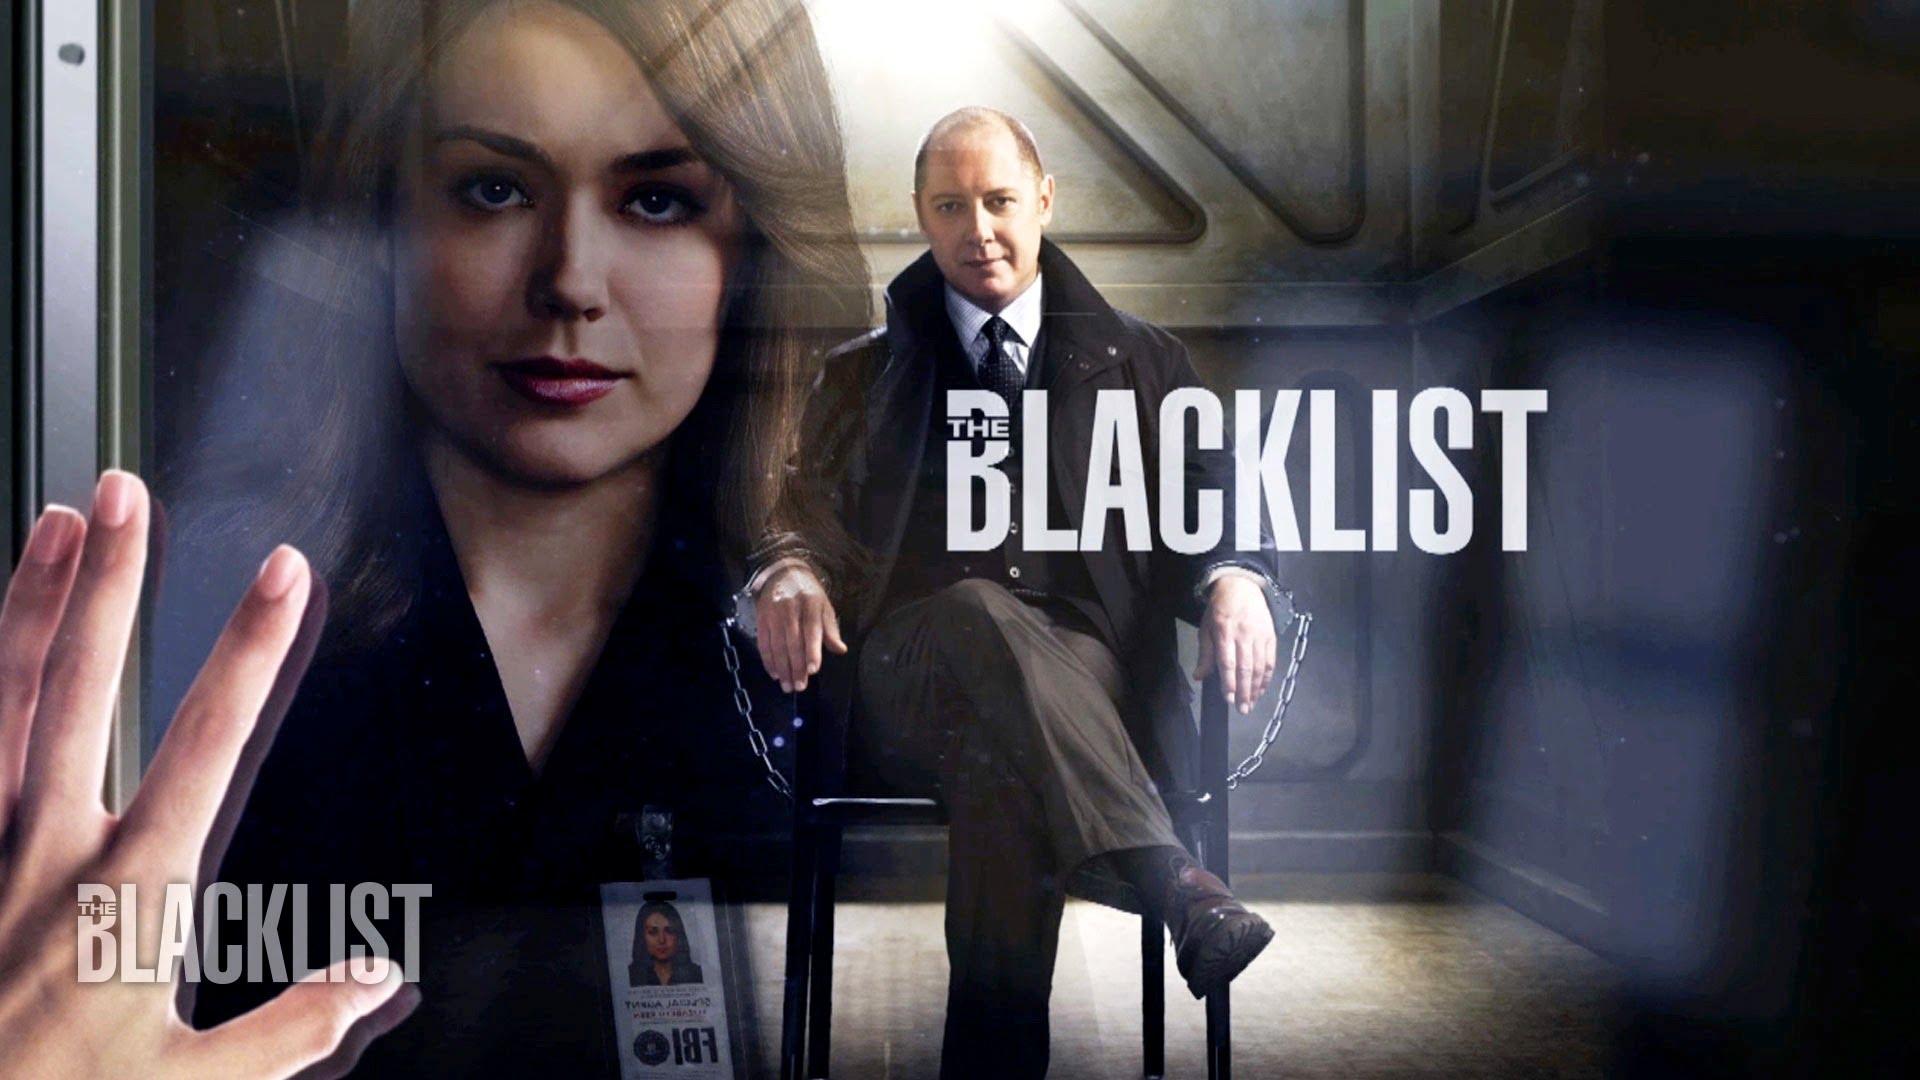 Theblacklist Shows Watch Fall